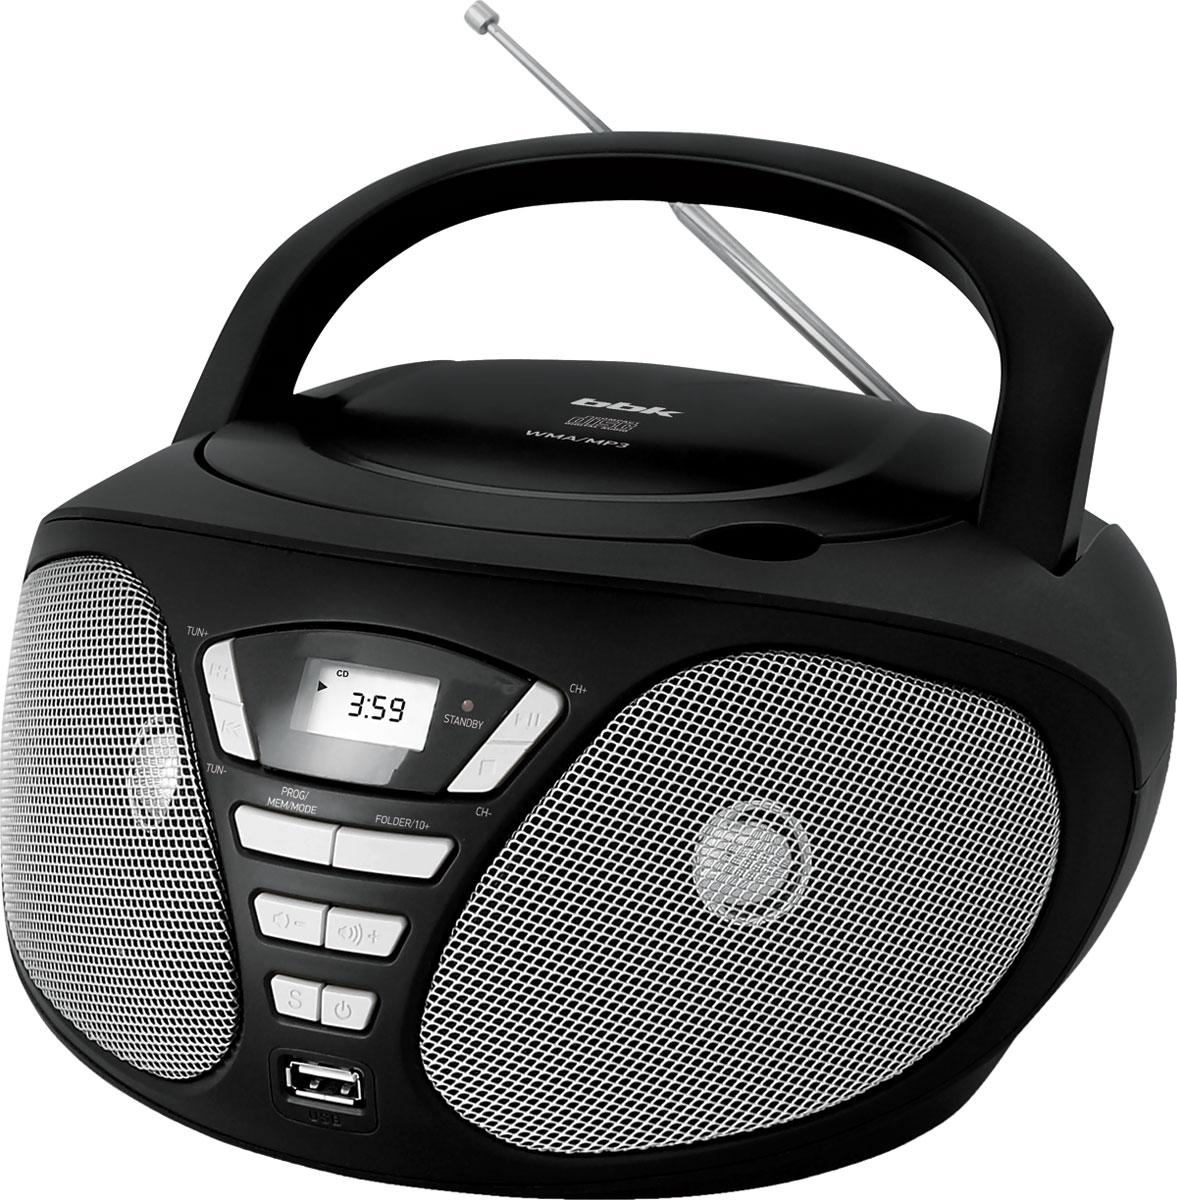 Магнитола BBK BX180U, Black Grey CD/MP3 carprie super drop ship car stereo in dash fm aux input dvd cd usb mp3 receiver player 2308 mar713